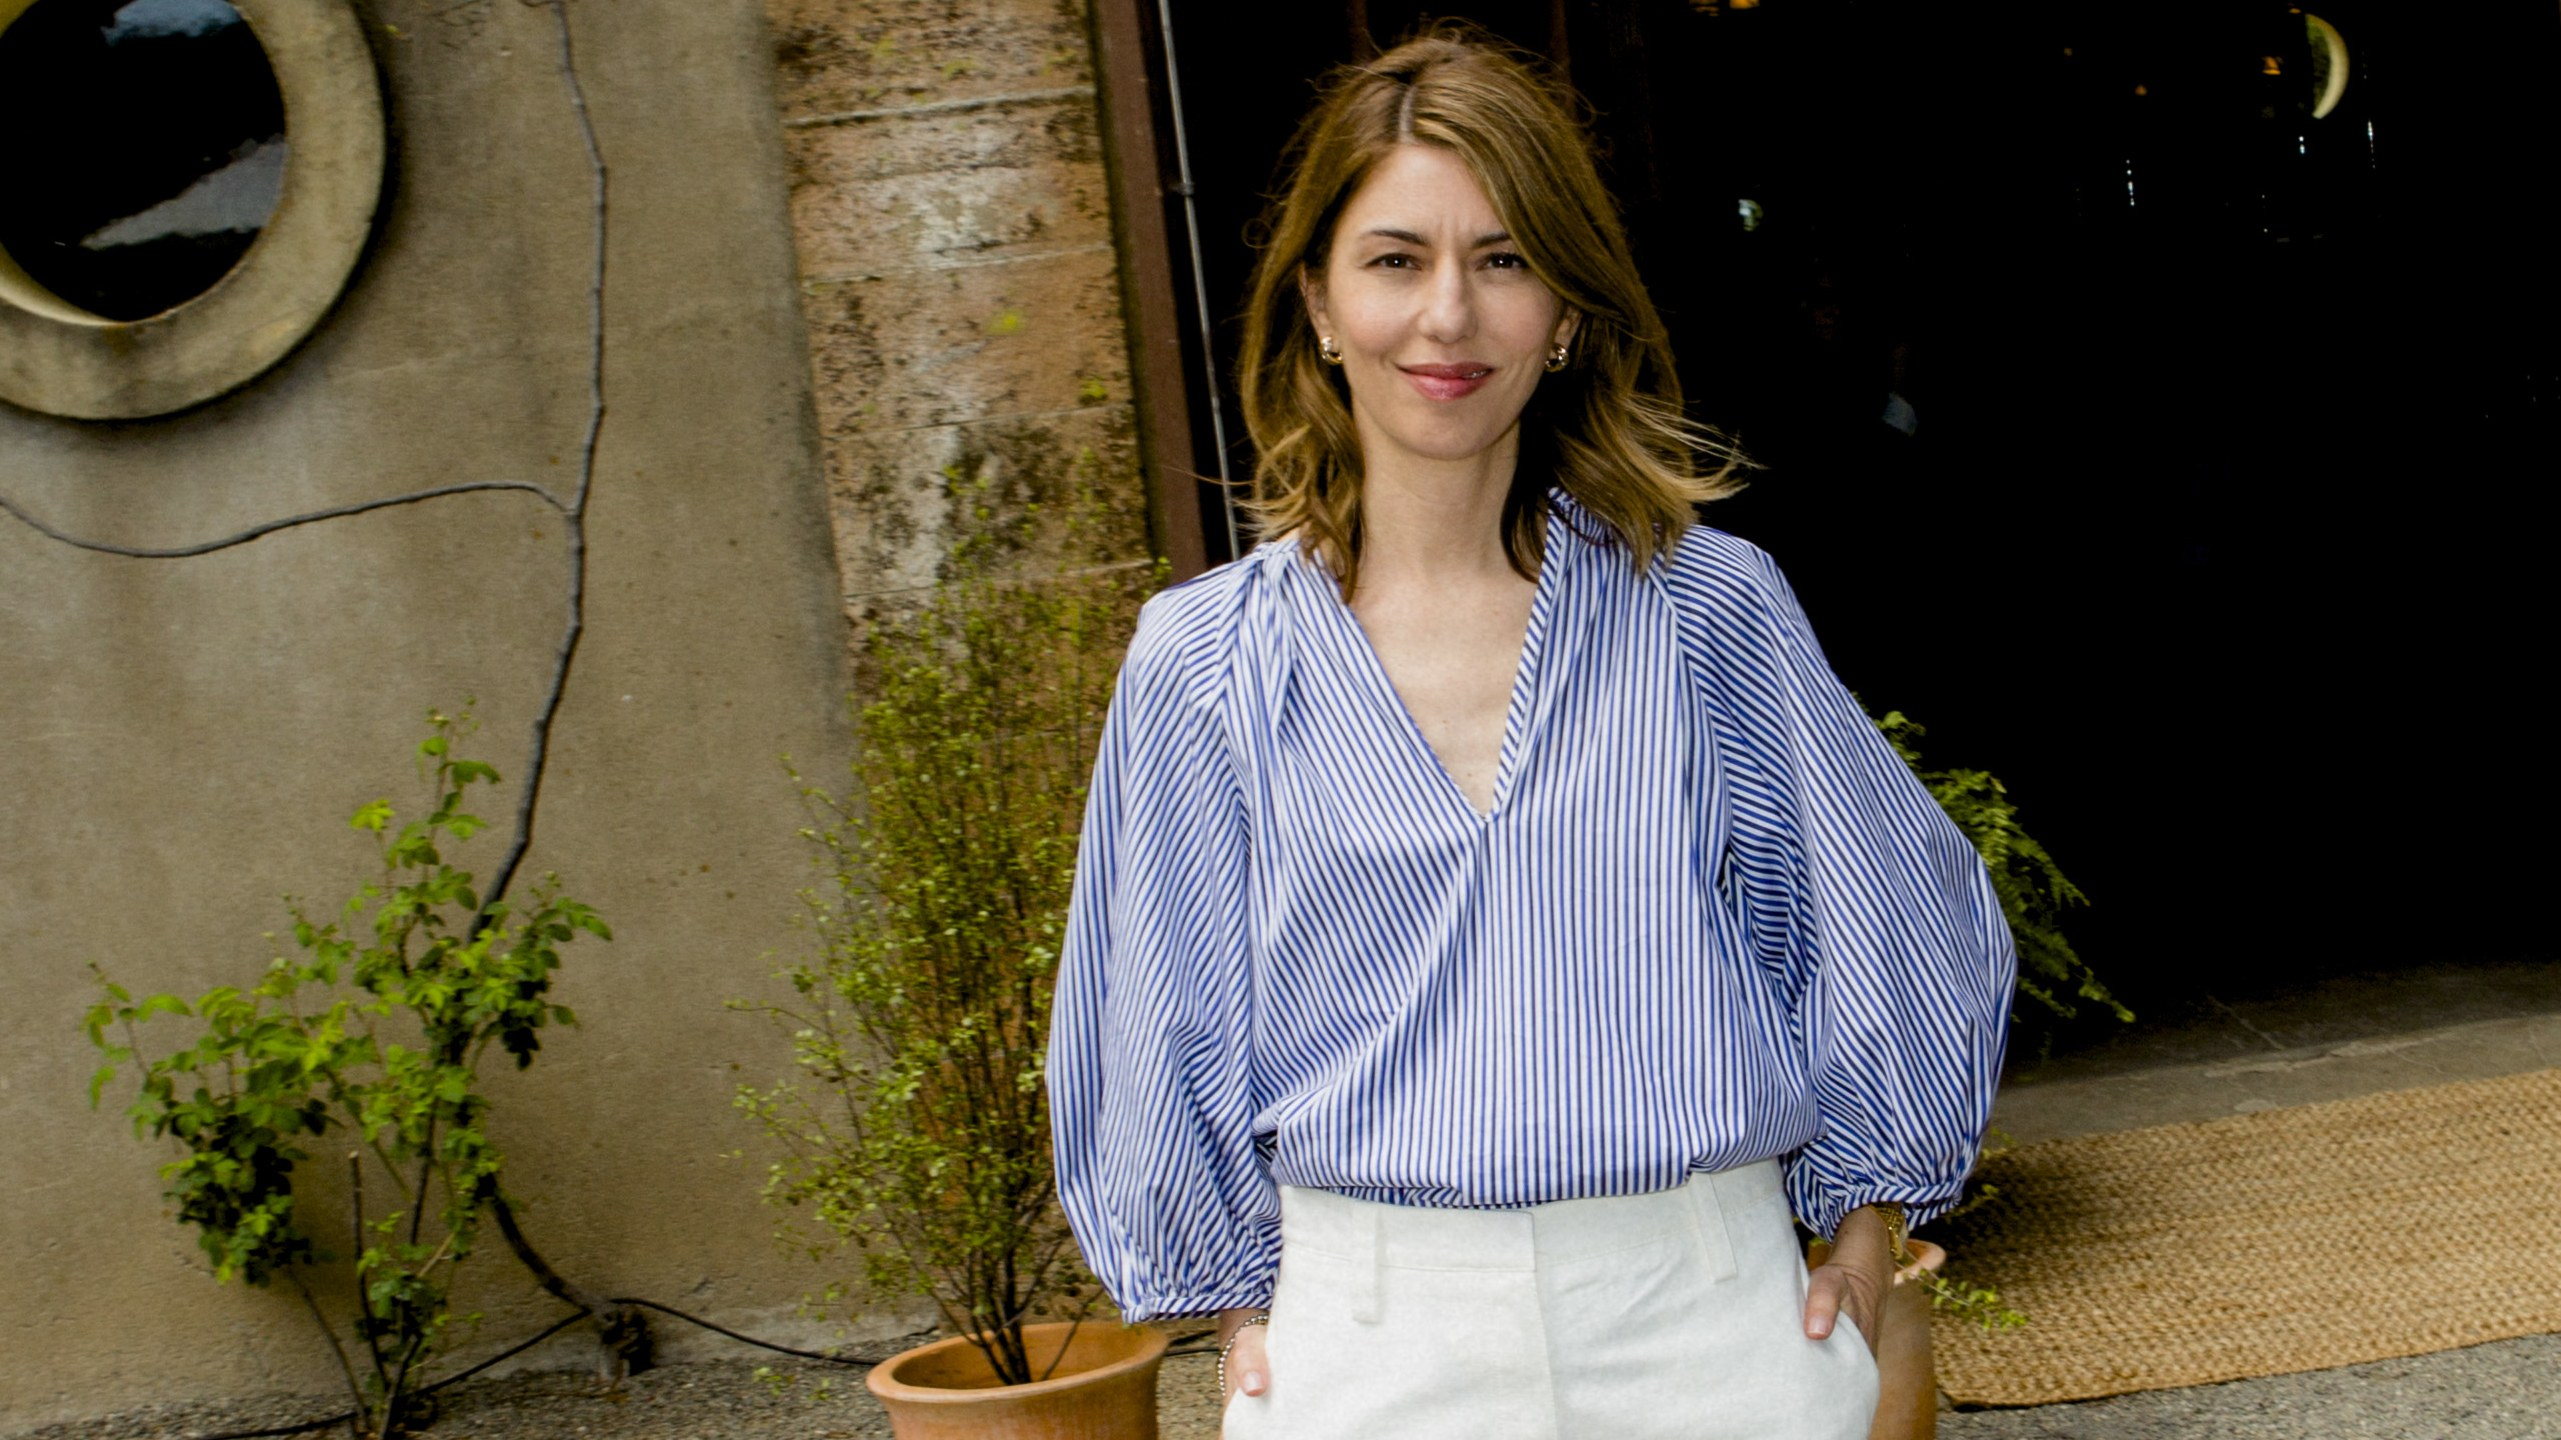 Sofia Coppola Reveals Her Tips For Hosting A Party photo